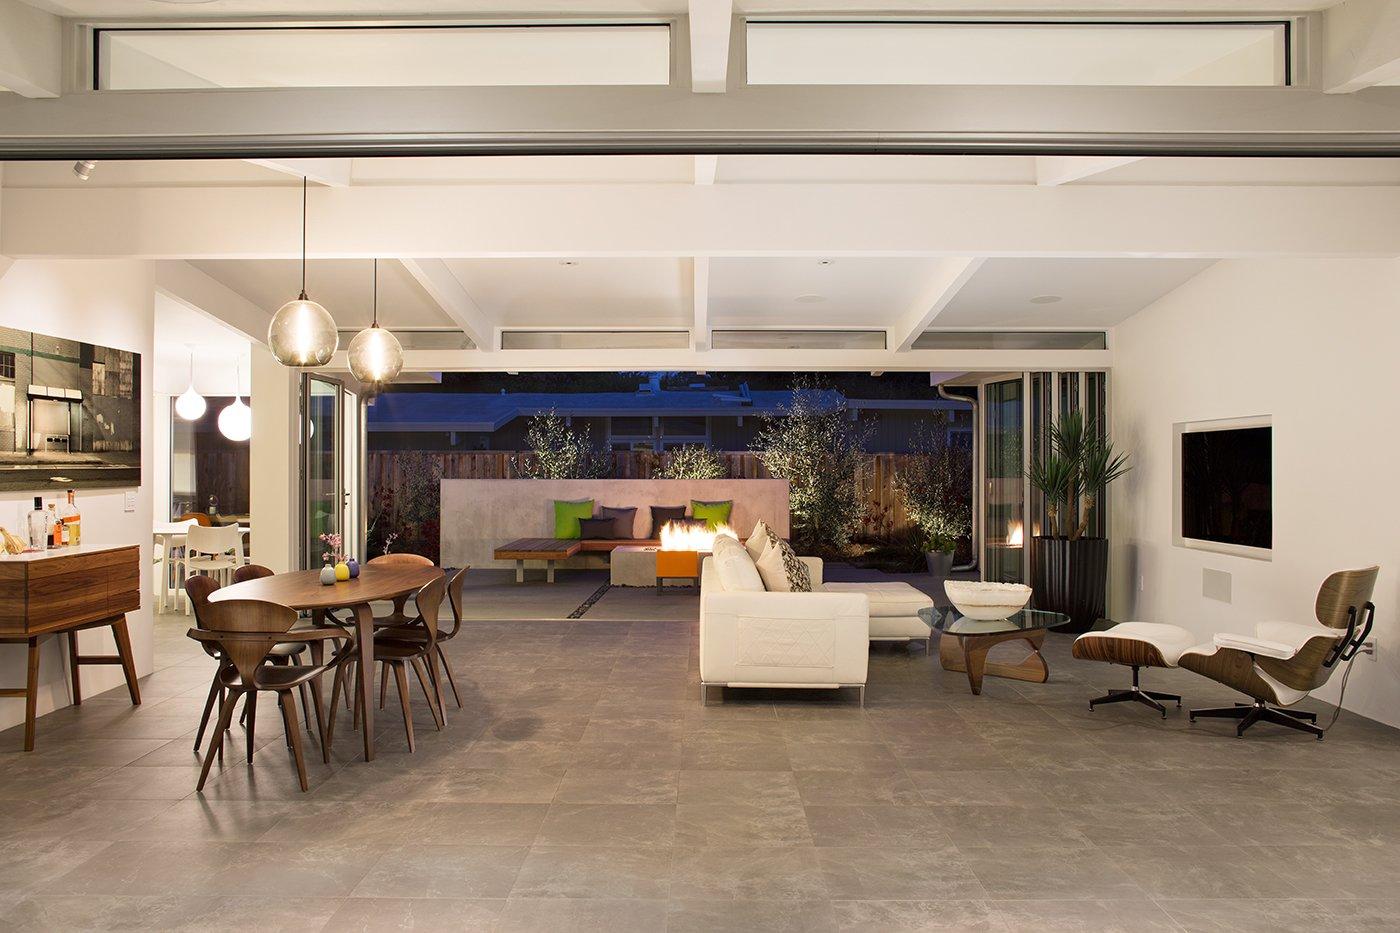 #midcenturymodern #interior #inside #livingroom #diningroom #Cherner #Eames #Stamen #lighting #Eichler #PaloAlto #California   Photo 20 of 24 in A Cherner Chair Retrospective